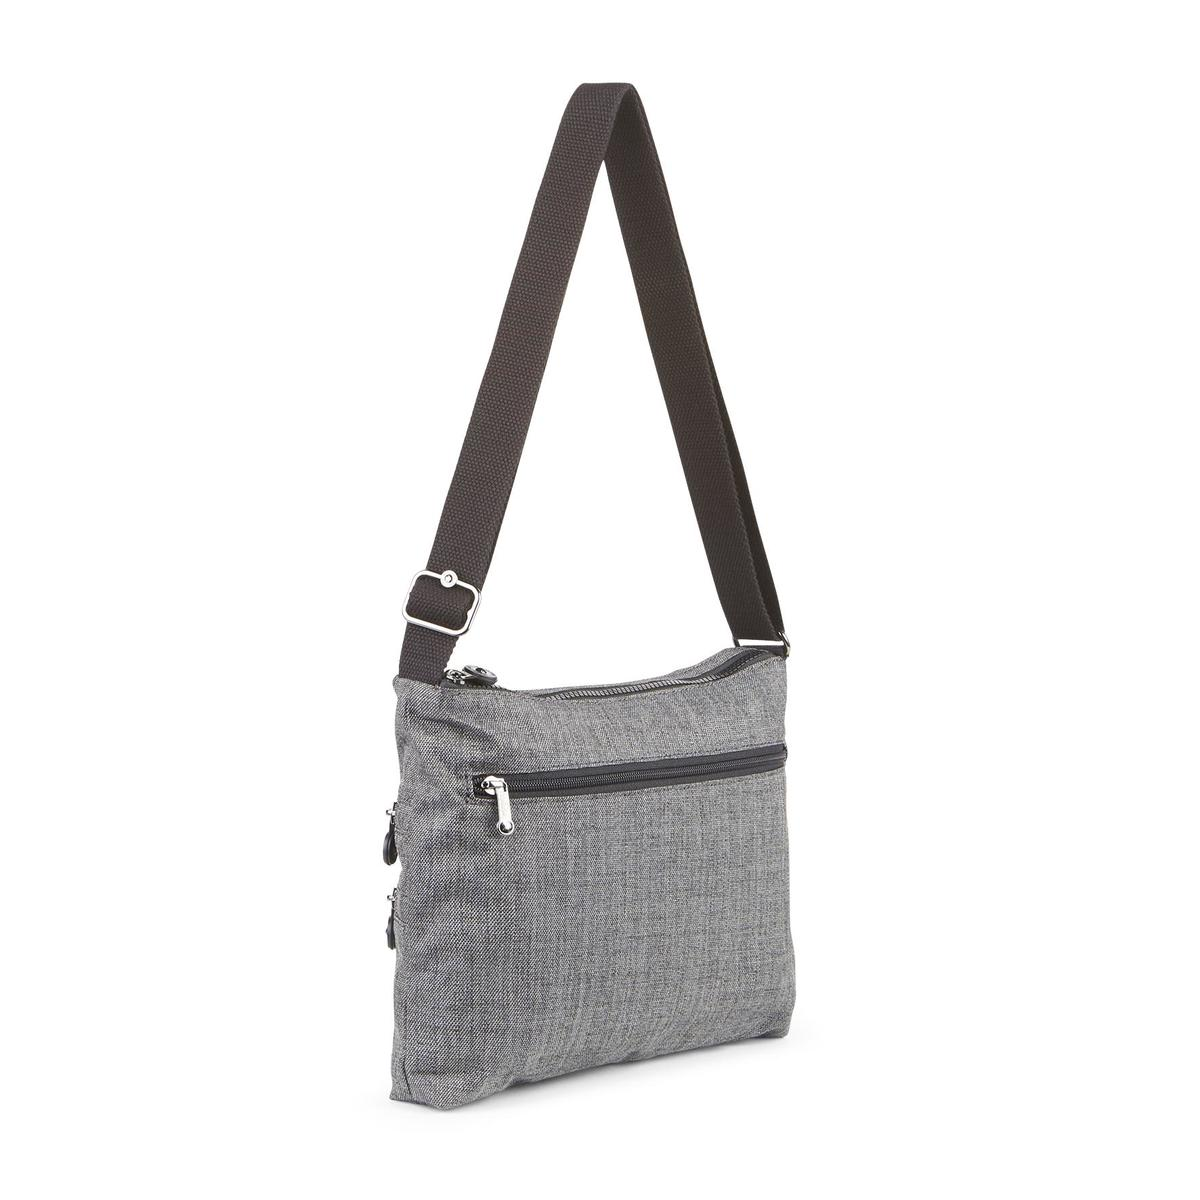 70bbe6669 Kipling Bags ALVAR Grey multi handbag | Kipling Outlet